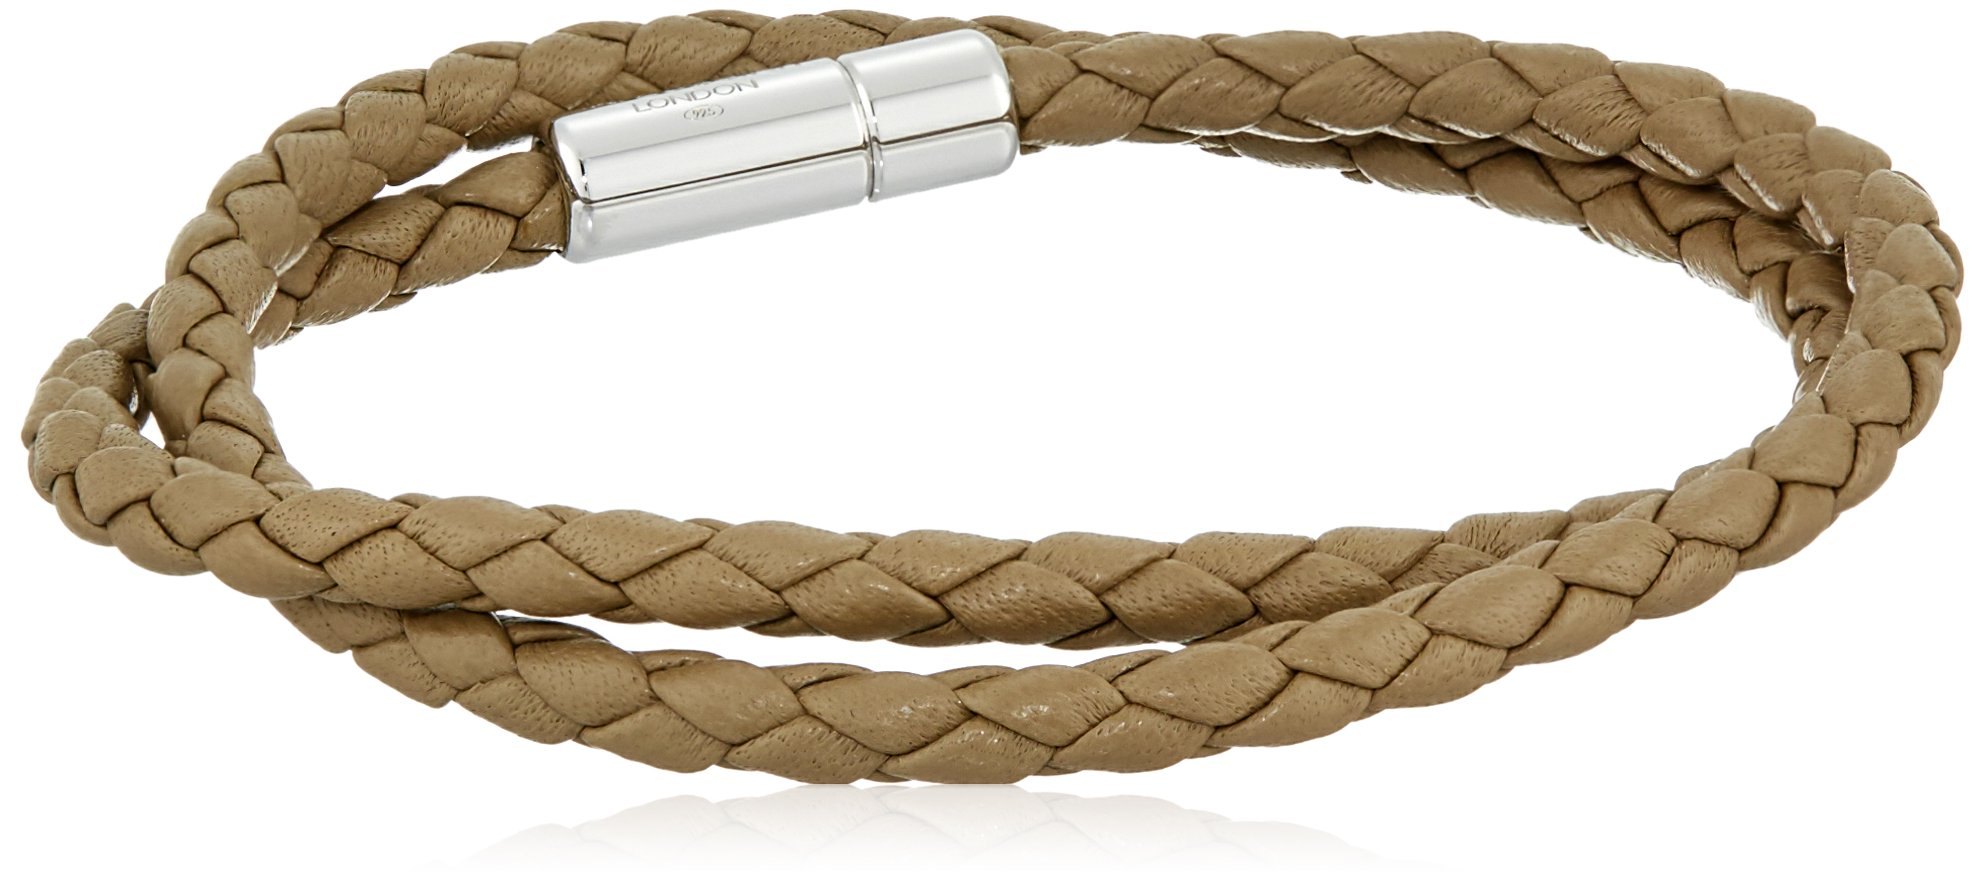 Tateossian Men's Scoubidou Pop Medium Light Brown Double Leather Wrap Bracelet